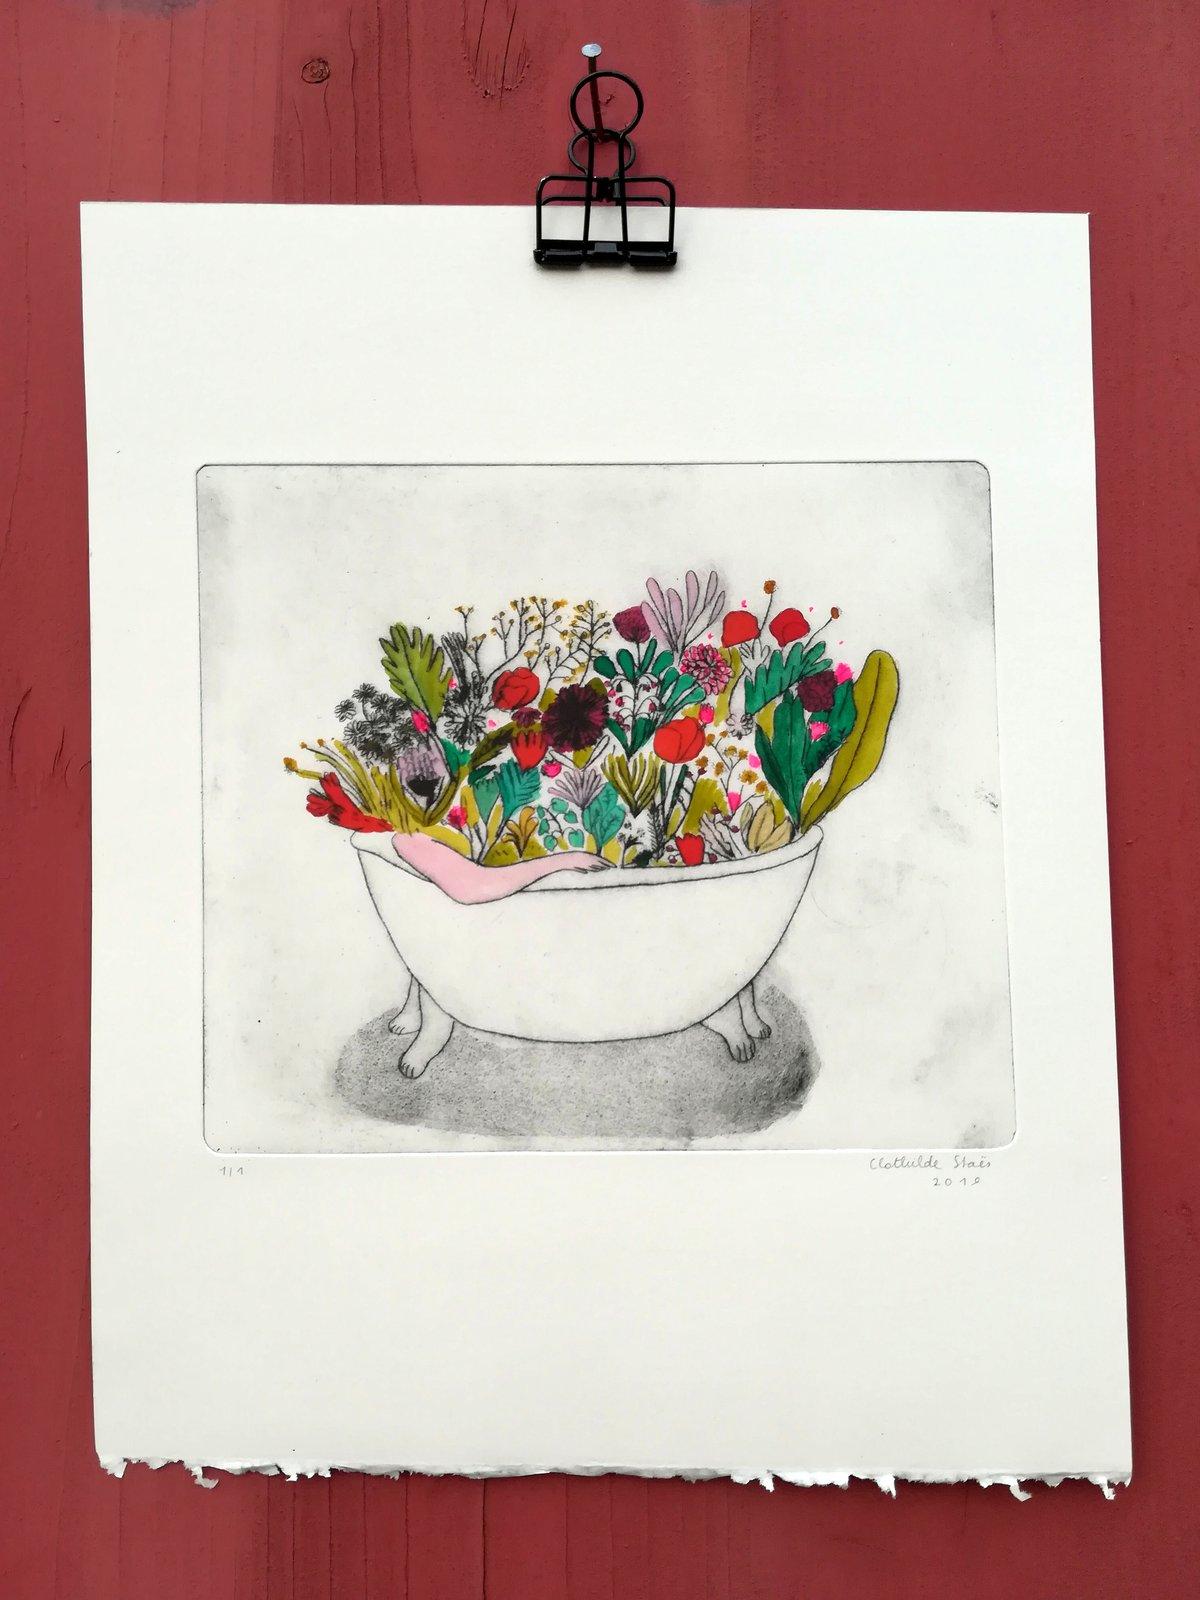 Image of Bain de fleurs